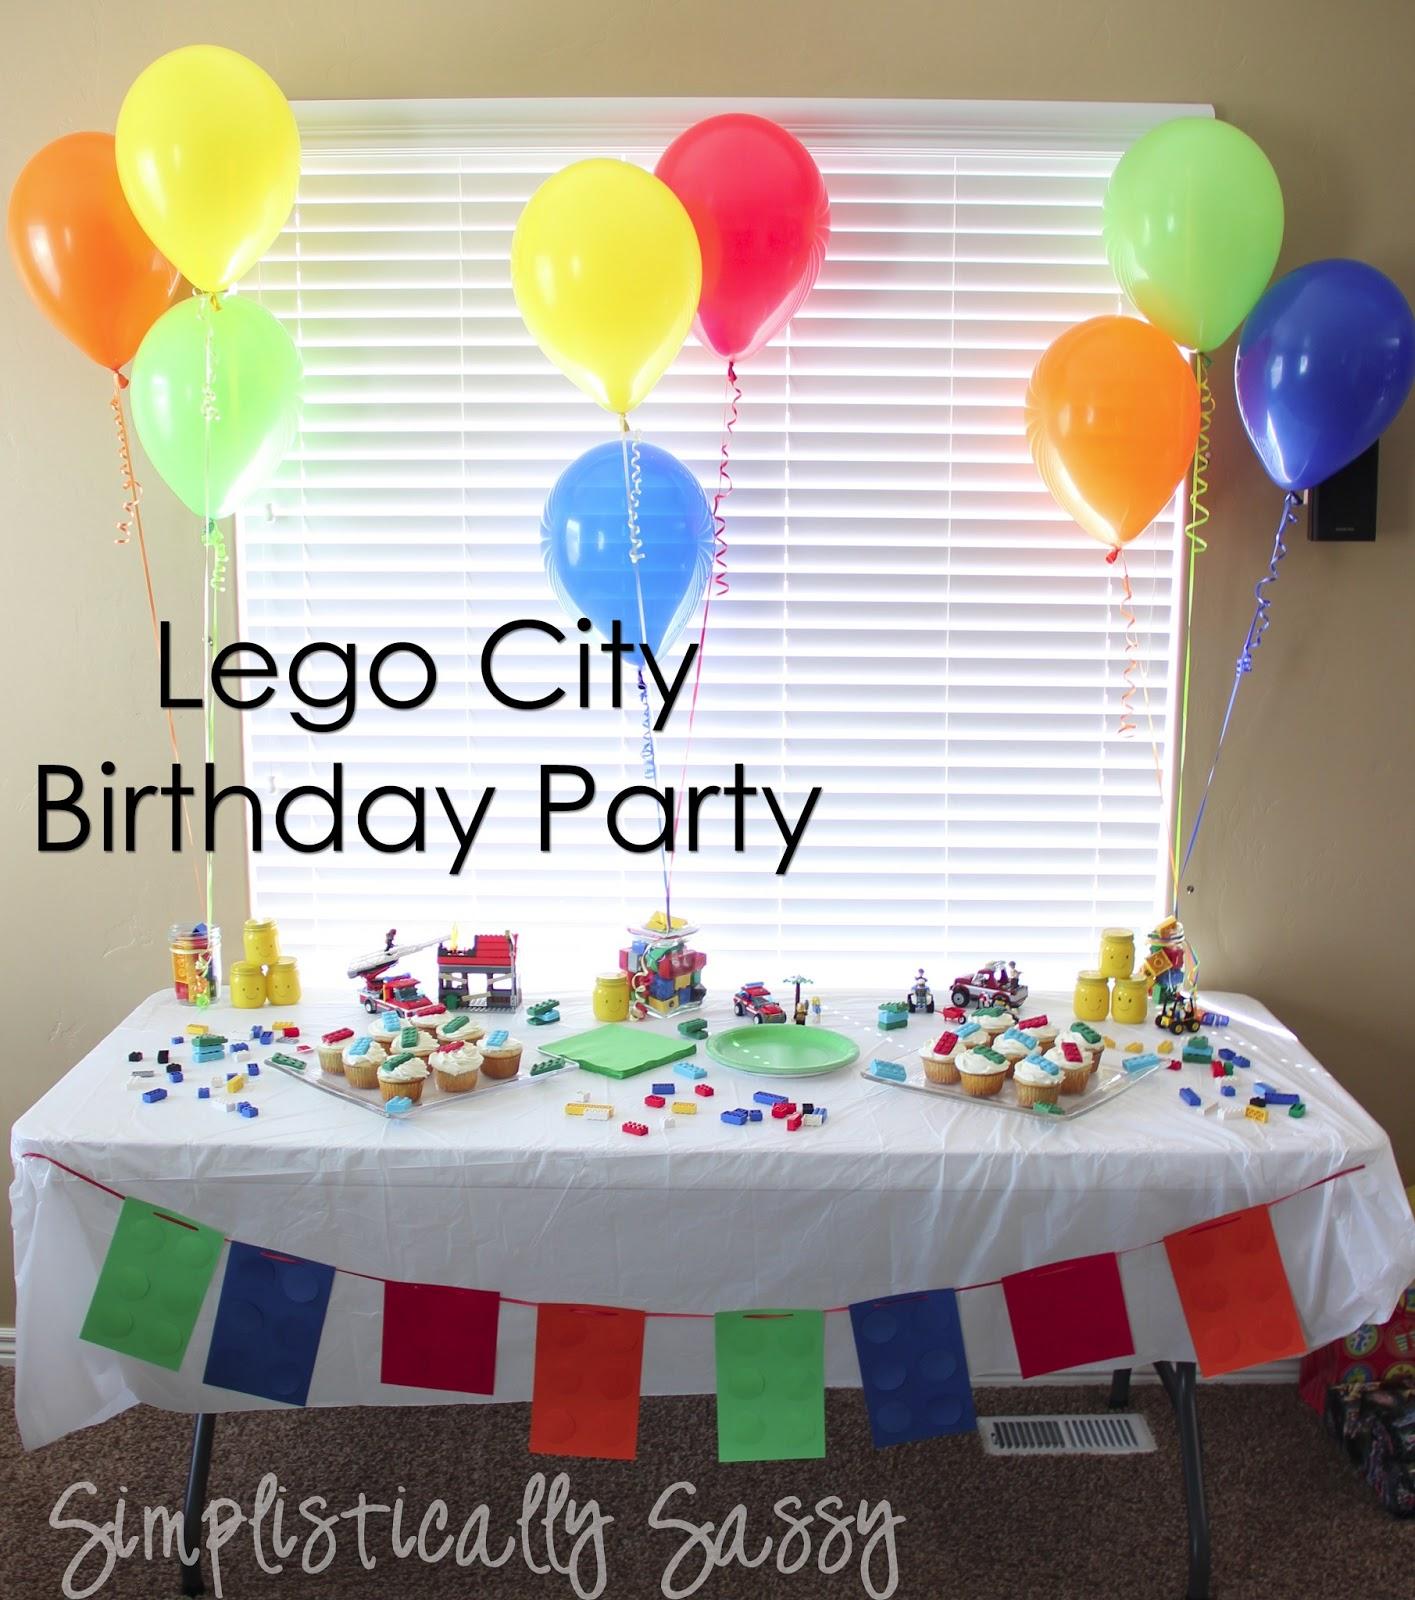 Lego Birthday Party By Simplistically Sassy